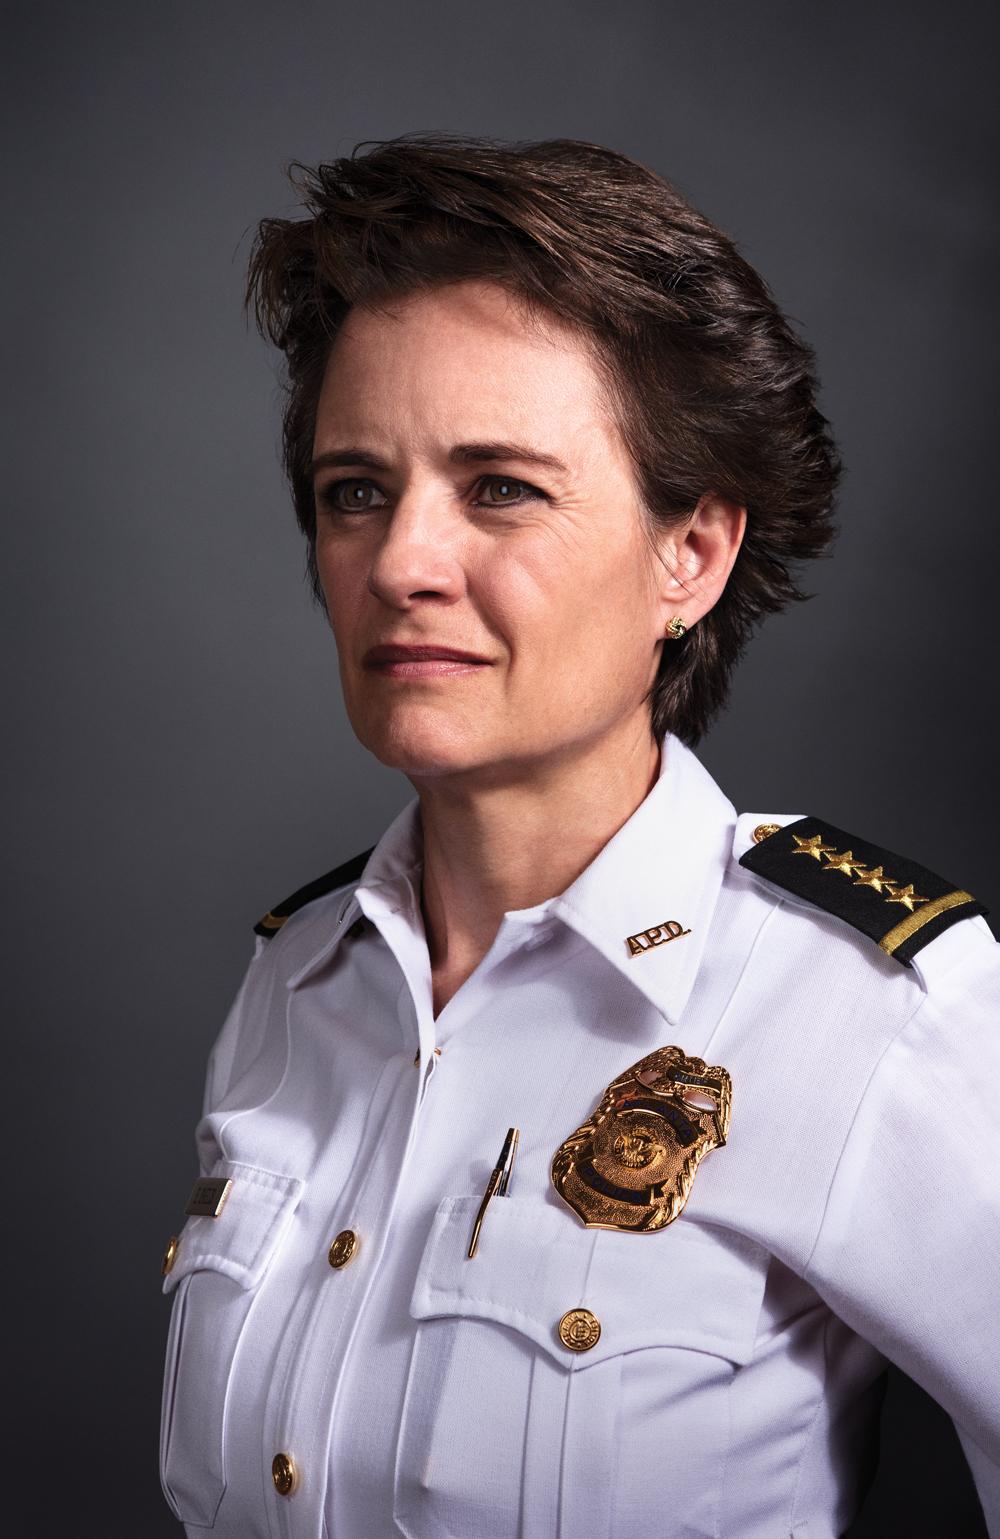 Erika Shields